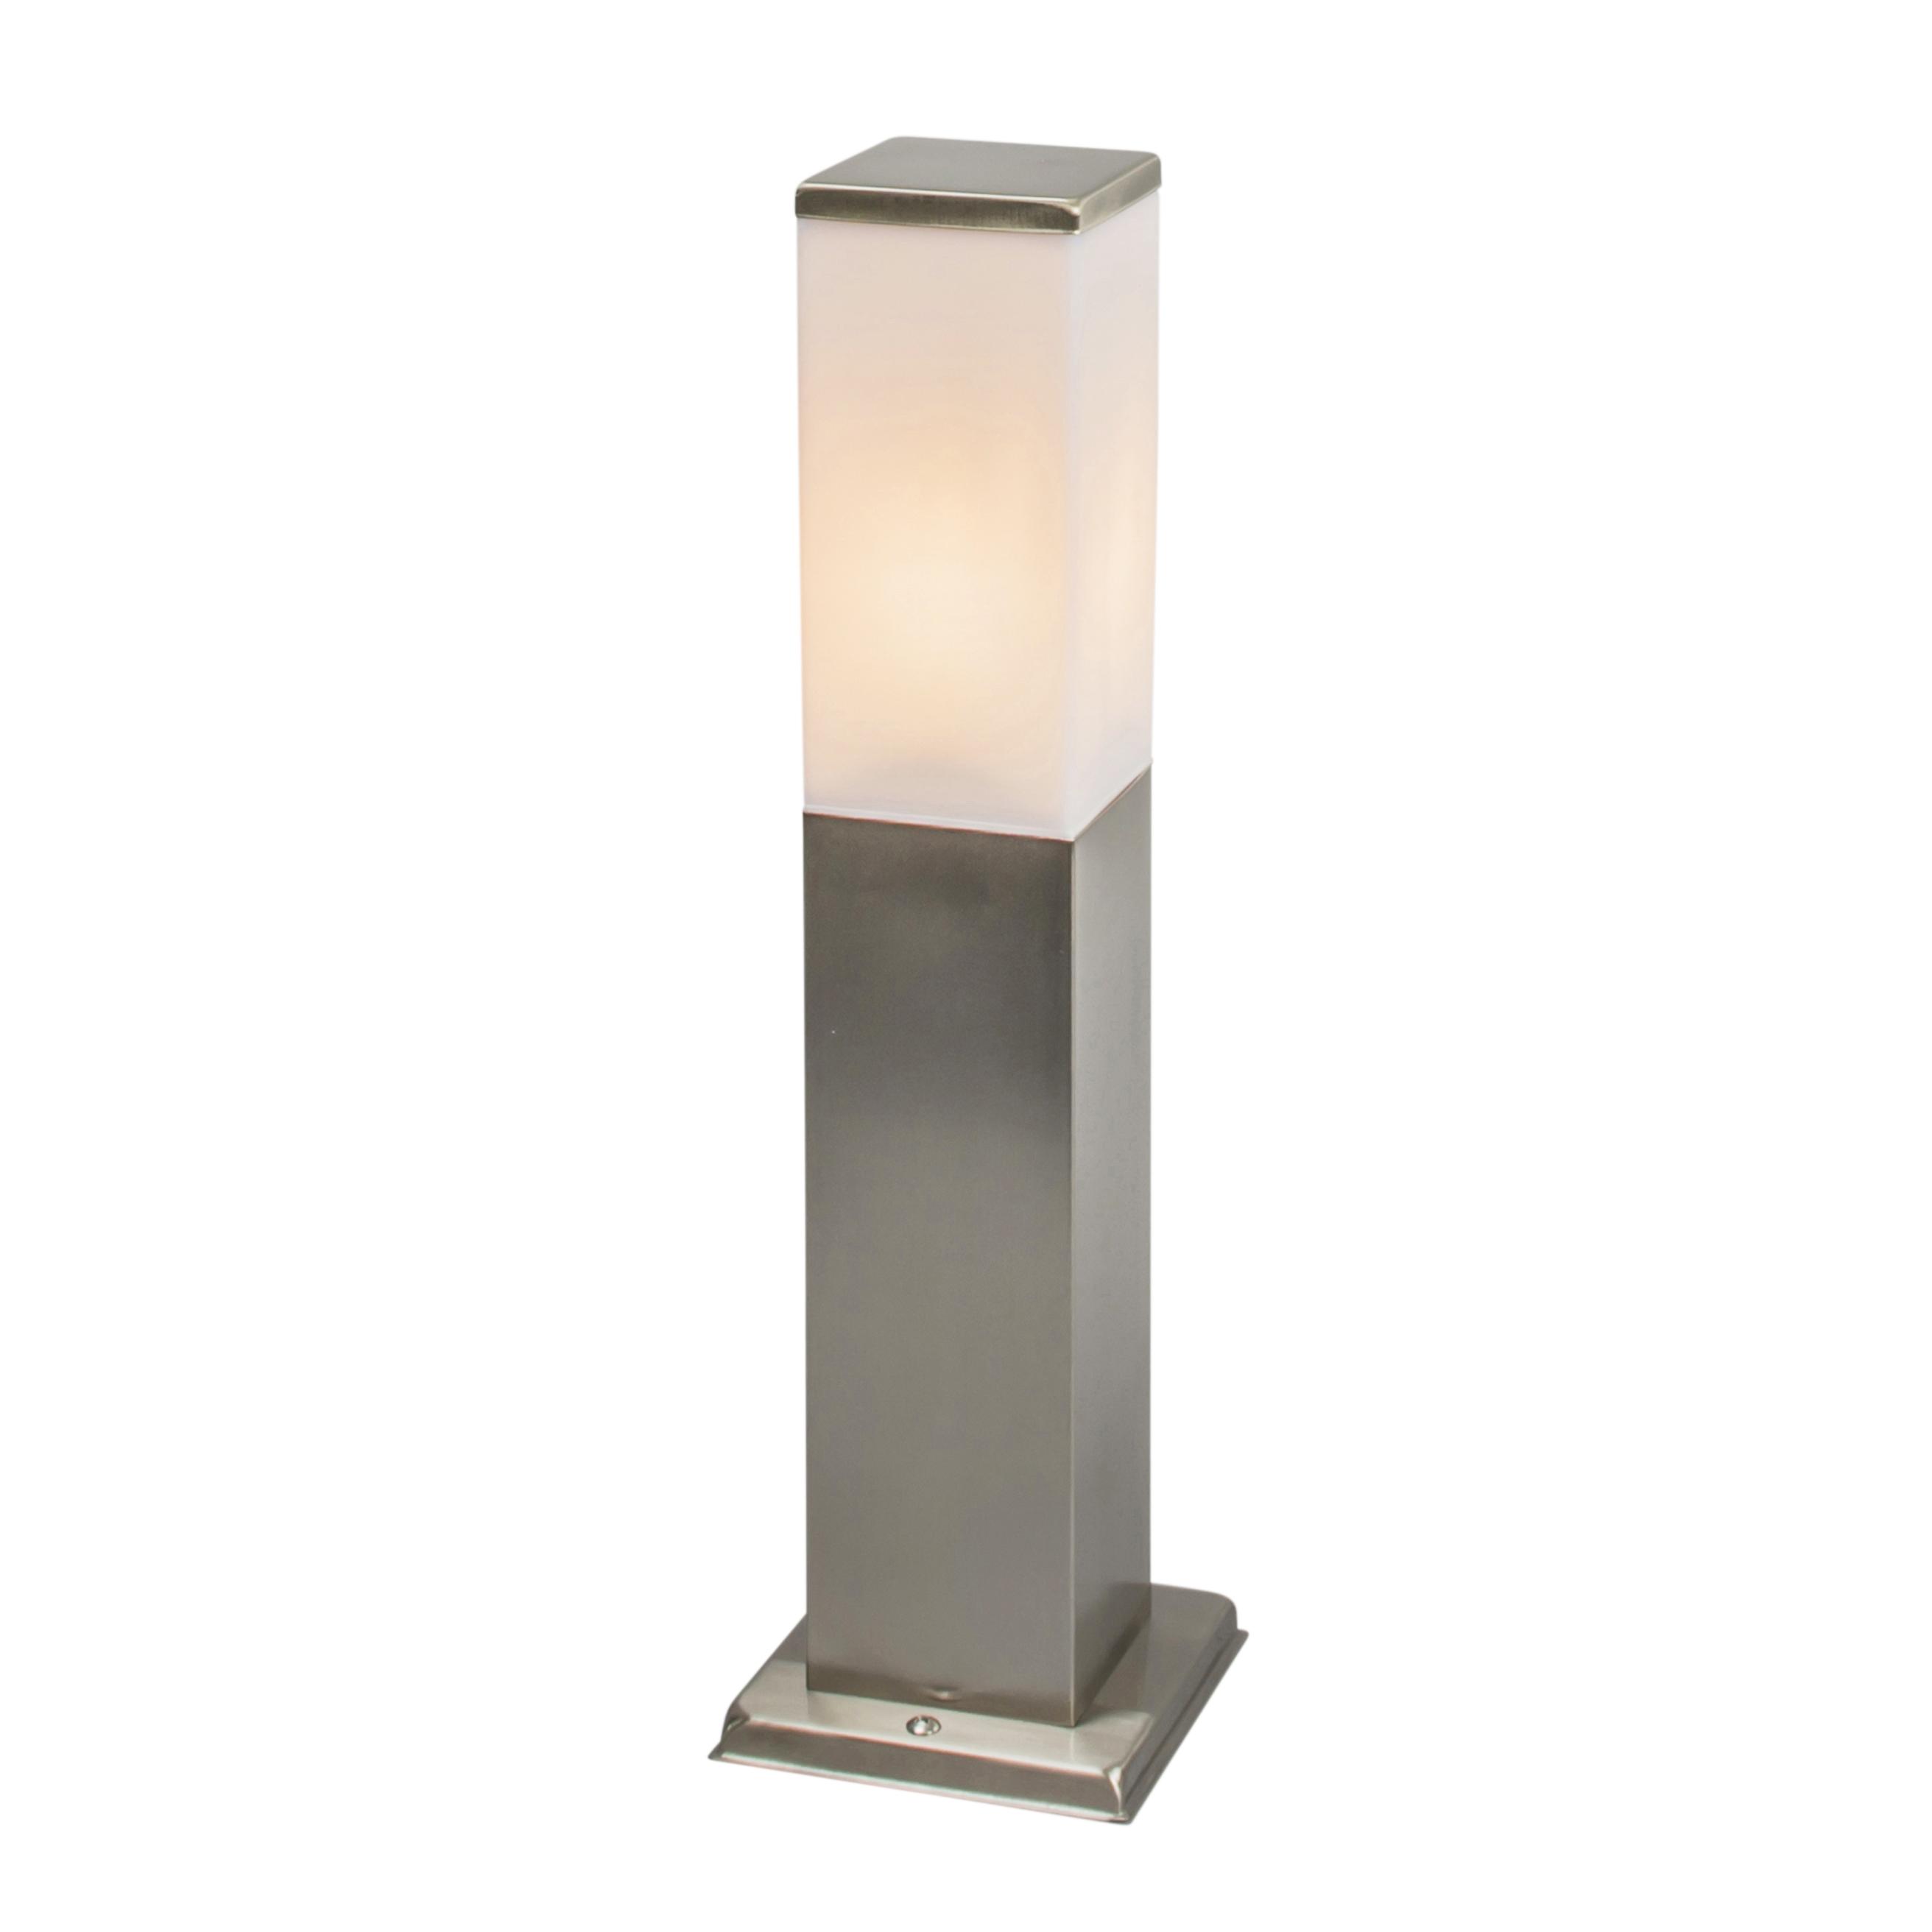 Moderne buitenlamp 45 cm staal - Malios